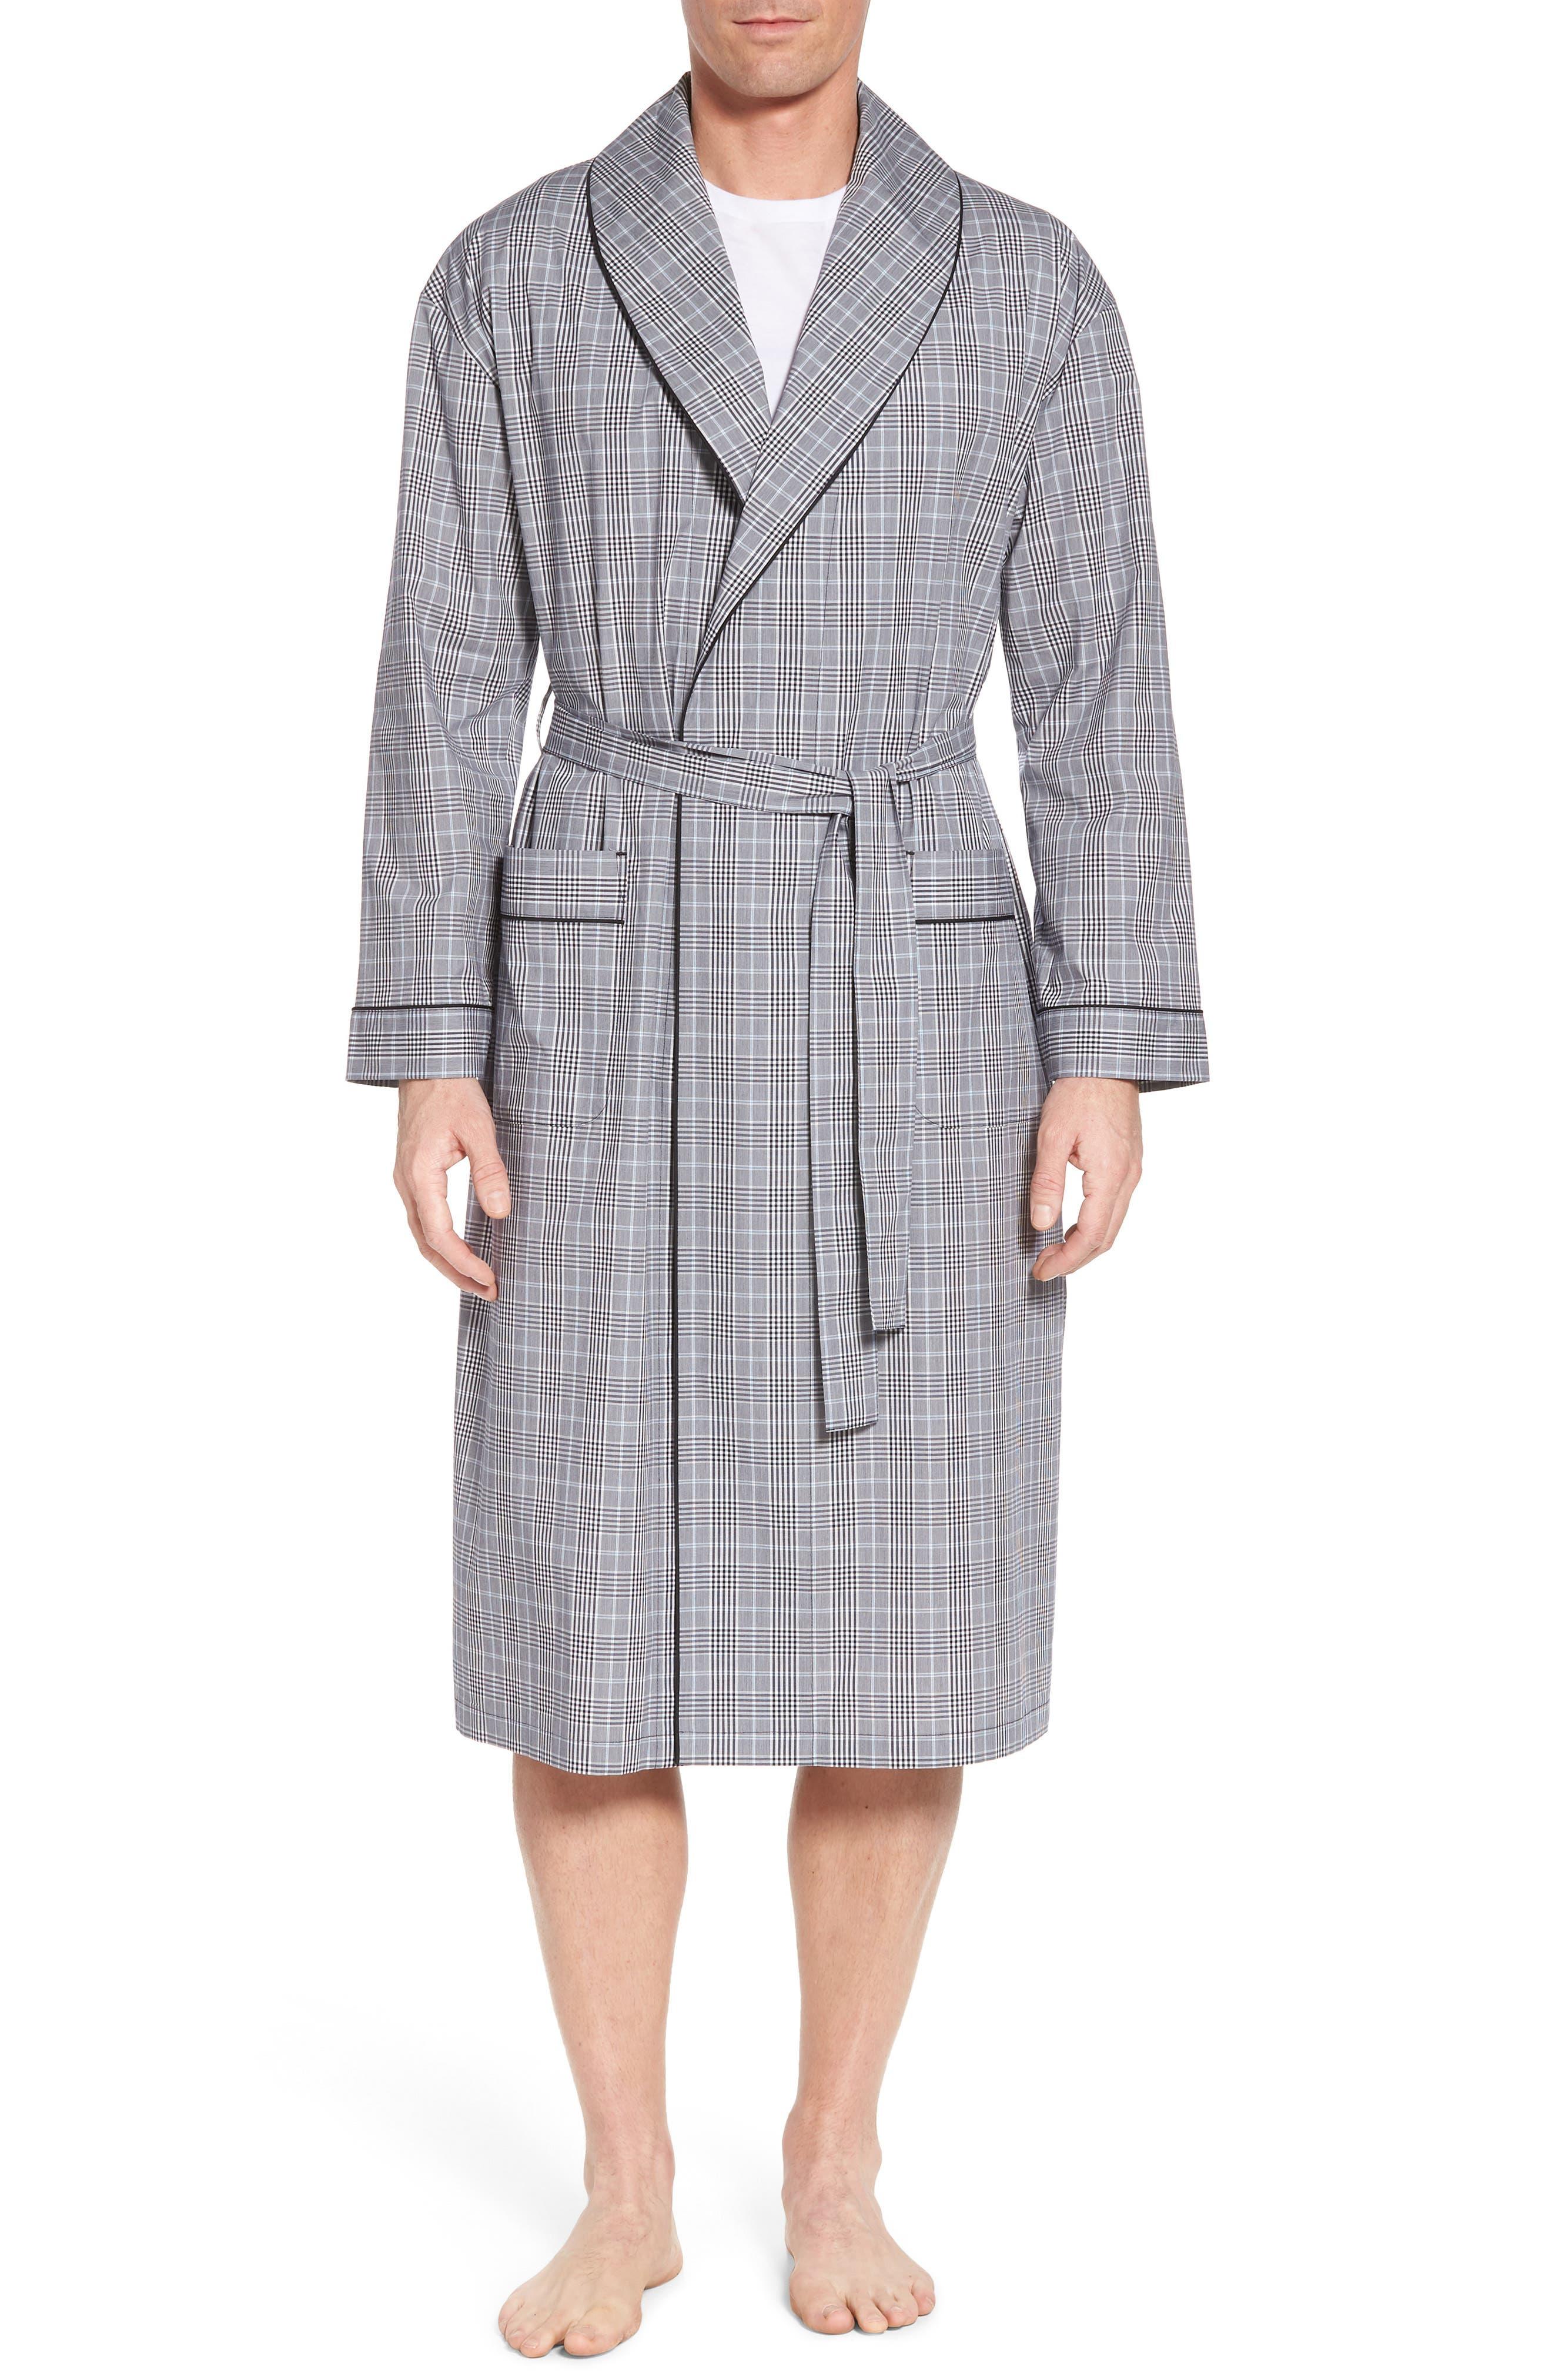 MAJESTIC INTERNATIONAL Charleston Robe, Main, color, 001